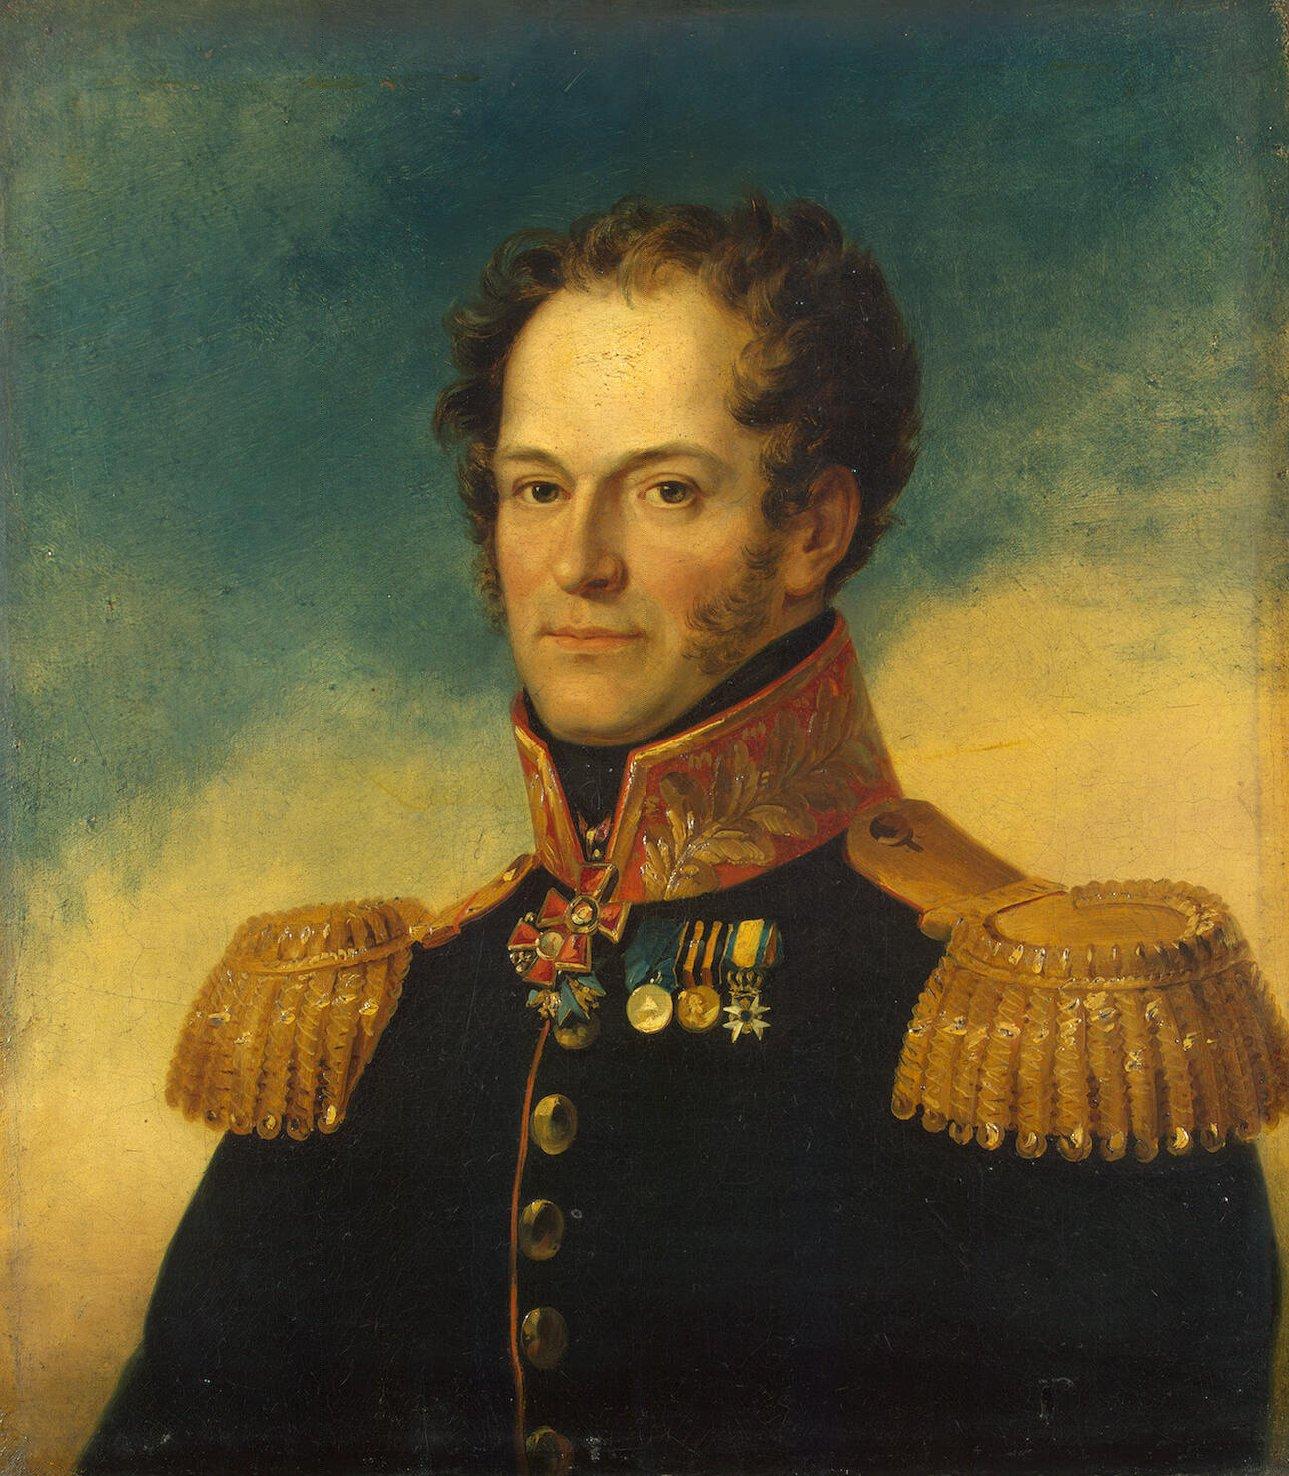 Мацнев, Михаил Николаевич